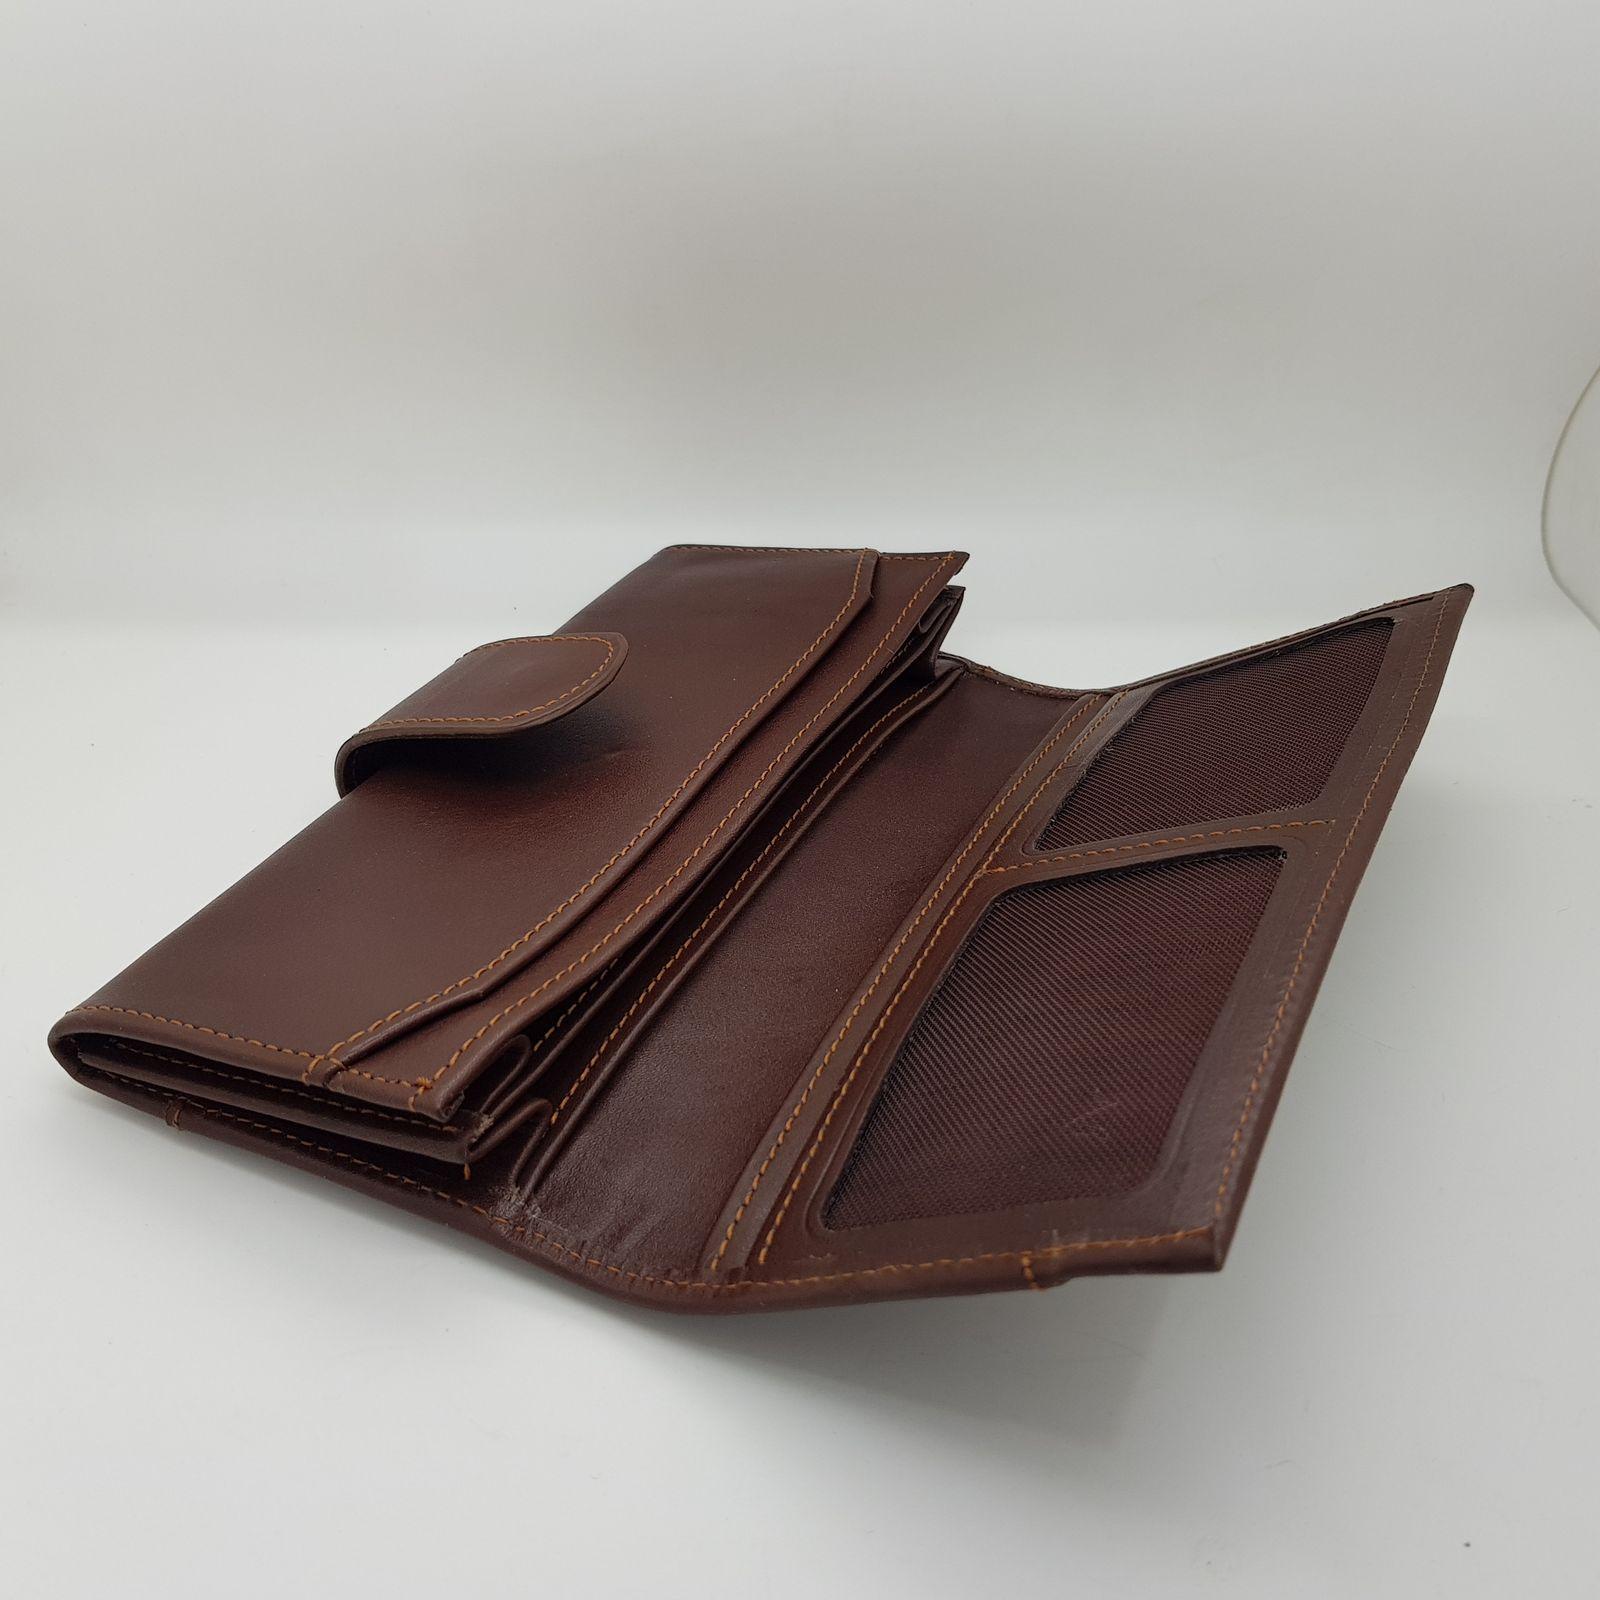 کیف پول زنانه چرم دیاکو مدل 315 -  - 14